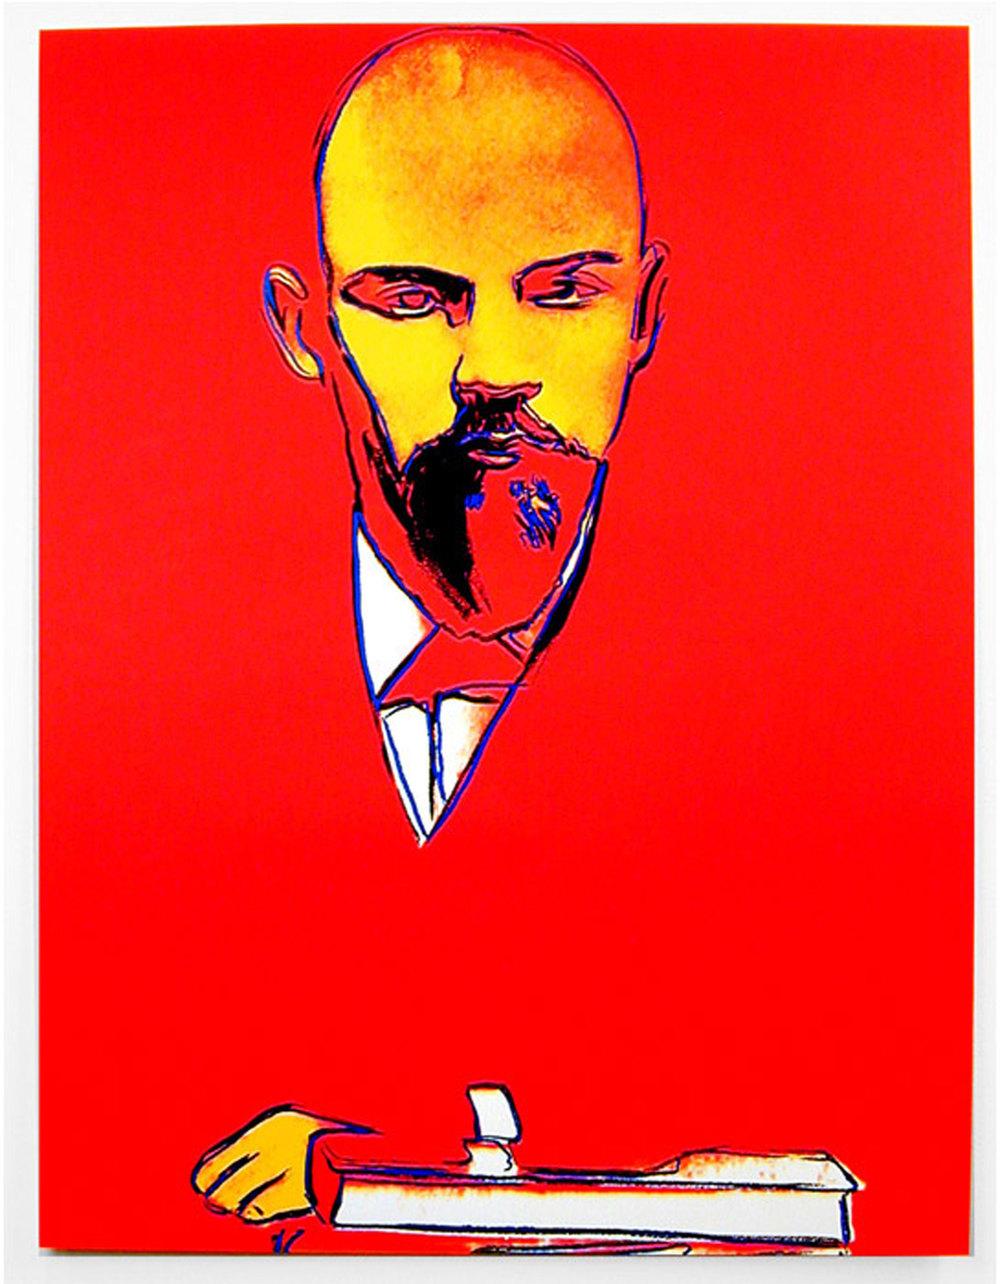 Andy-Warhol_-_Red-Lenin